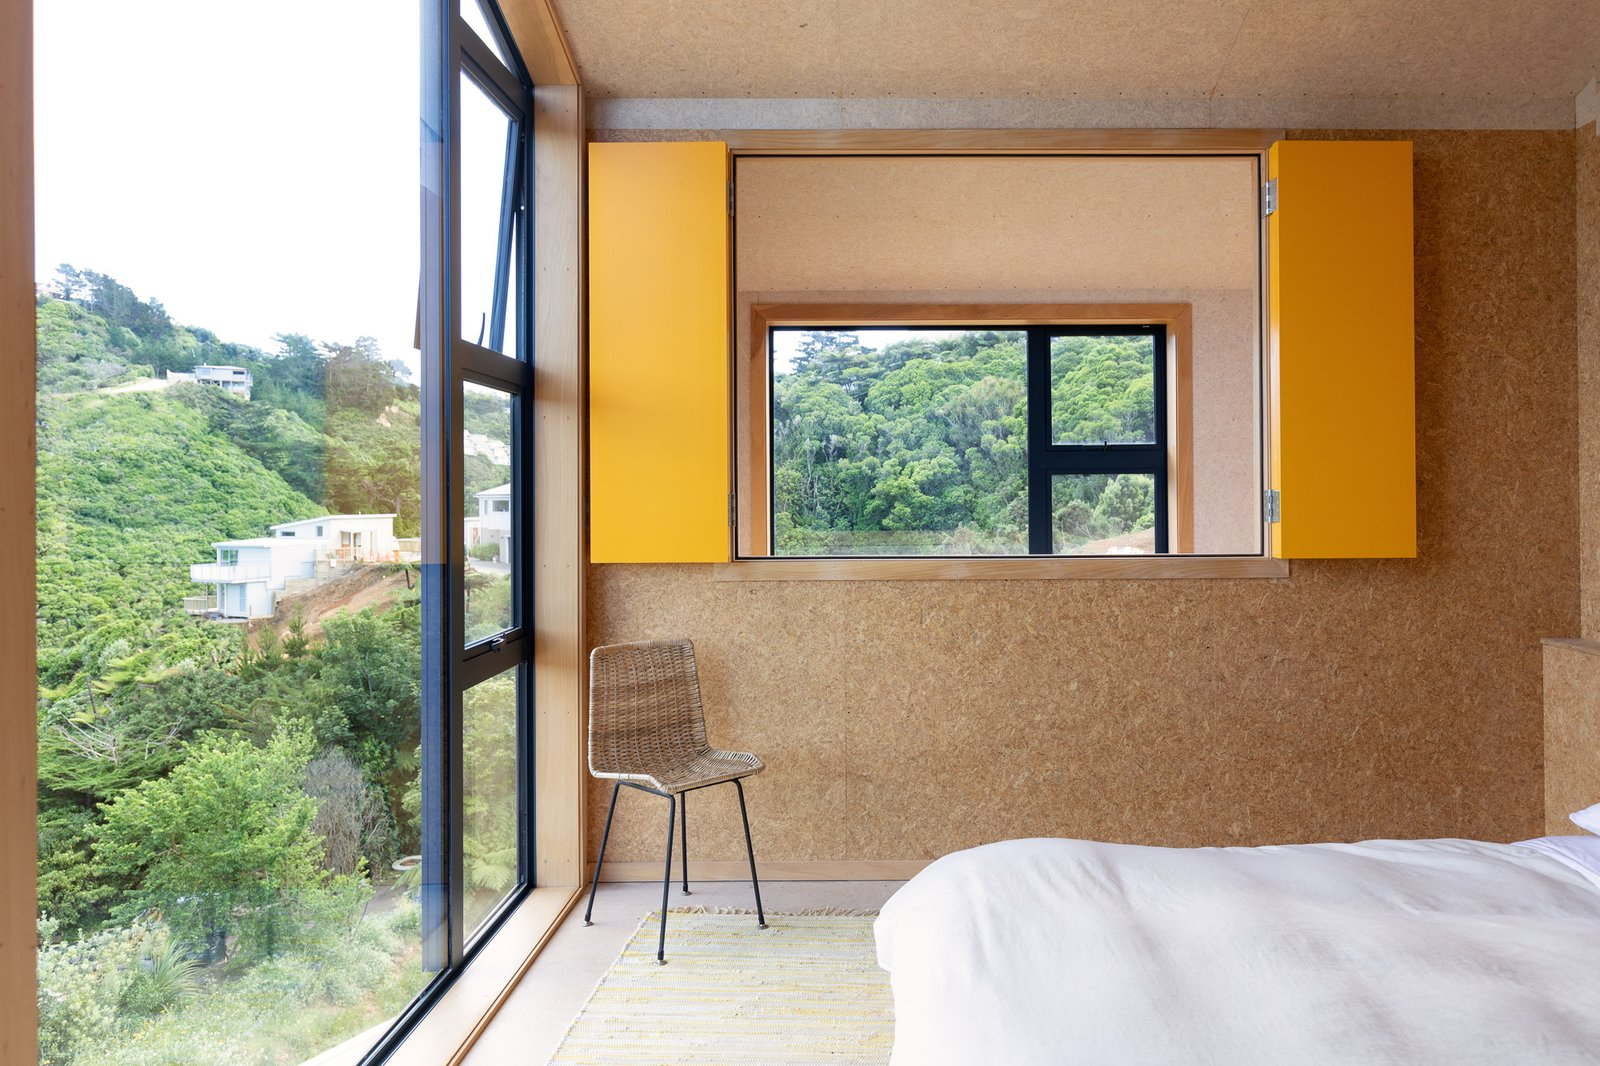 Bedroom at Thornton House by Bonnifait+Giesen.